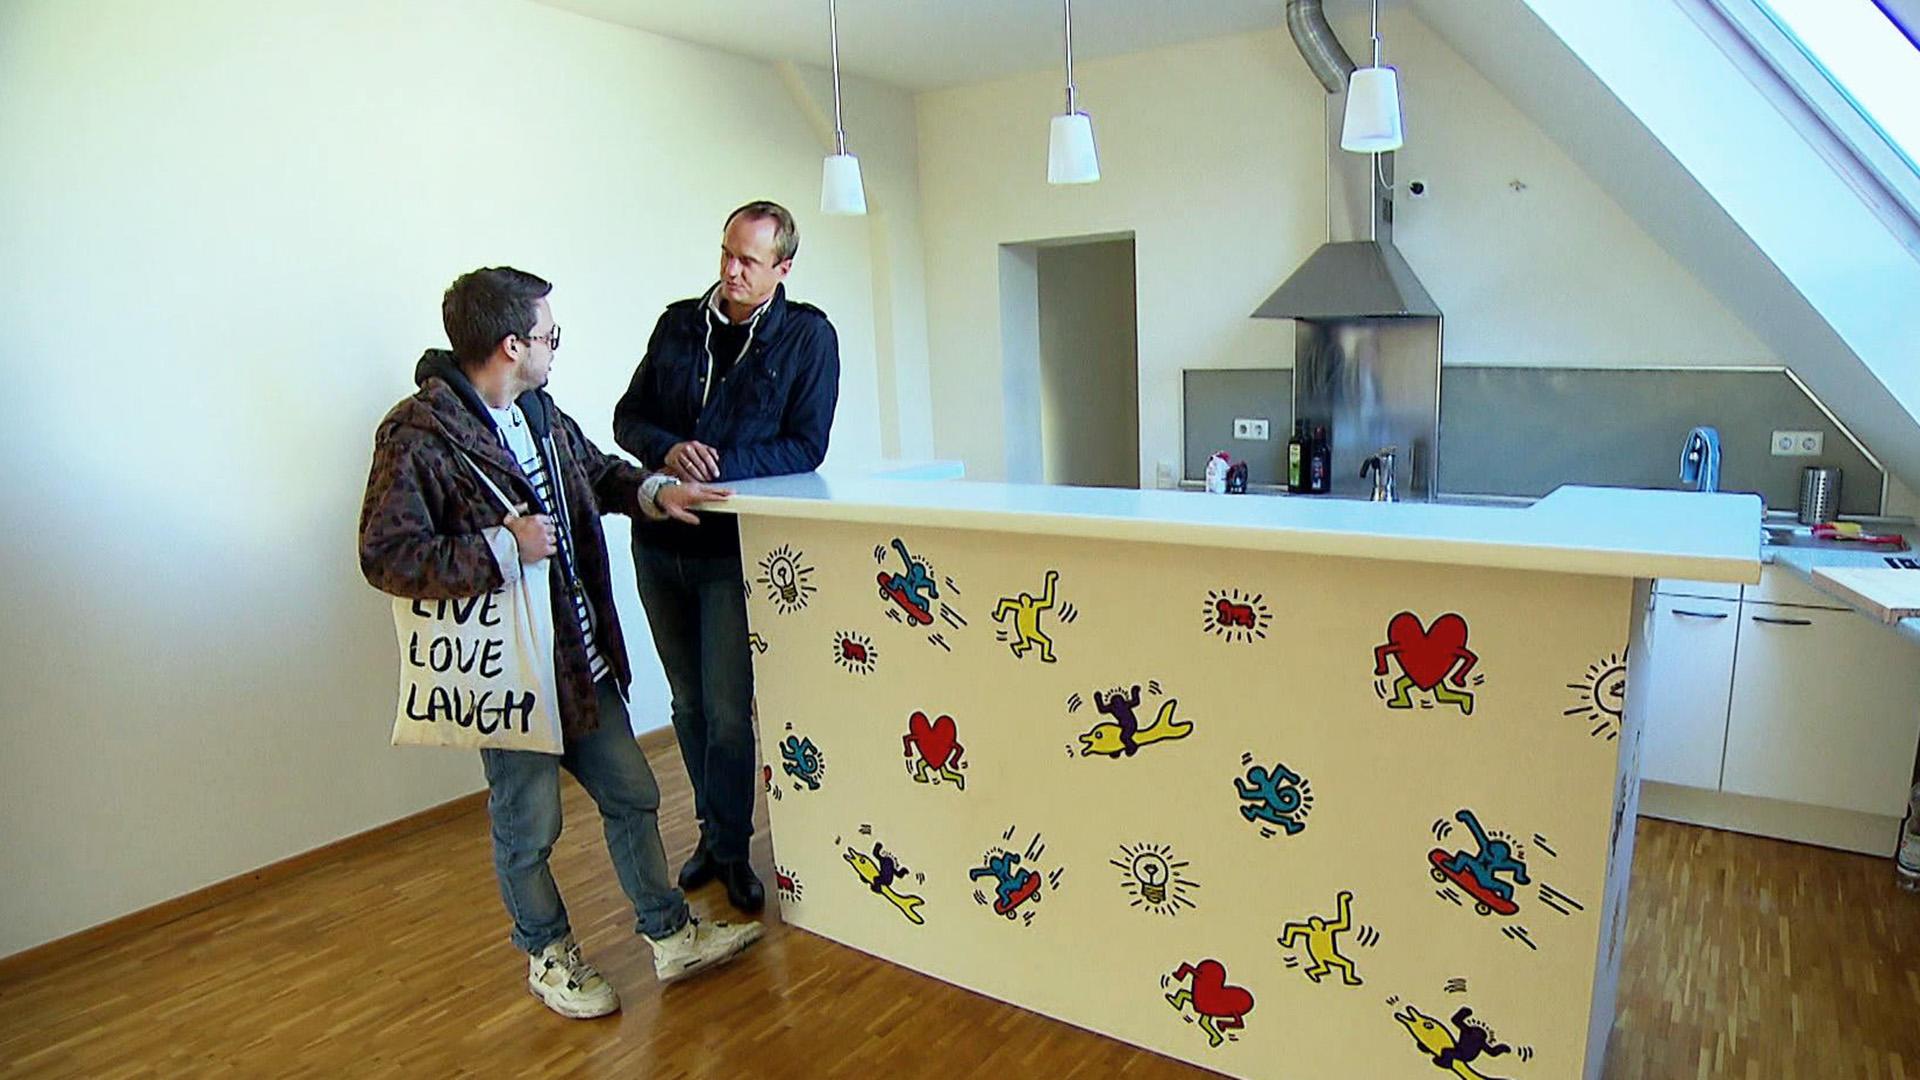 Radiomoderator sucht Single-Wohnung | Folge 13